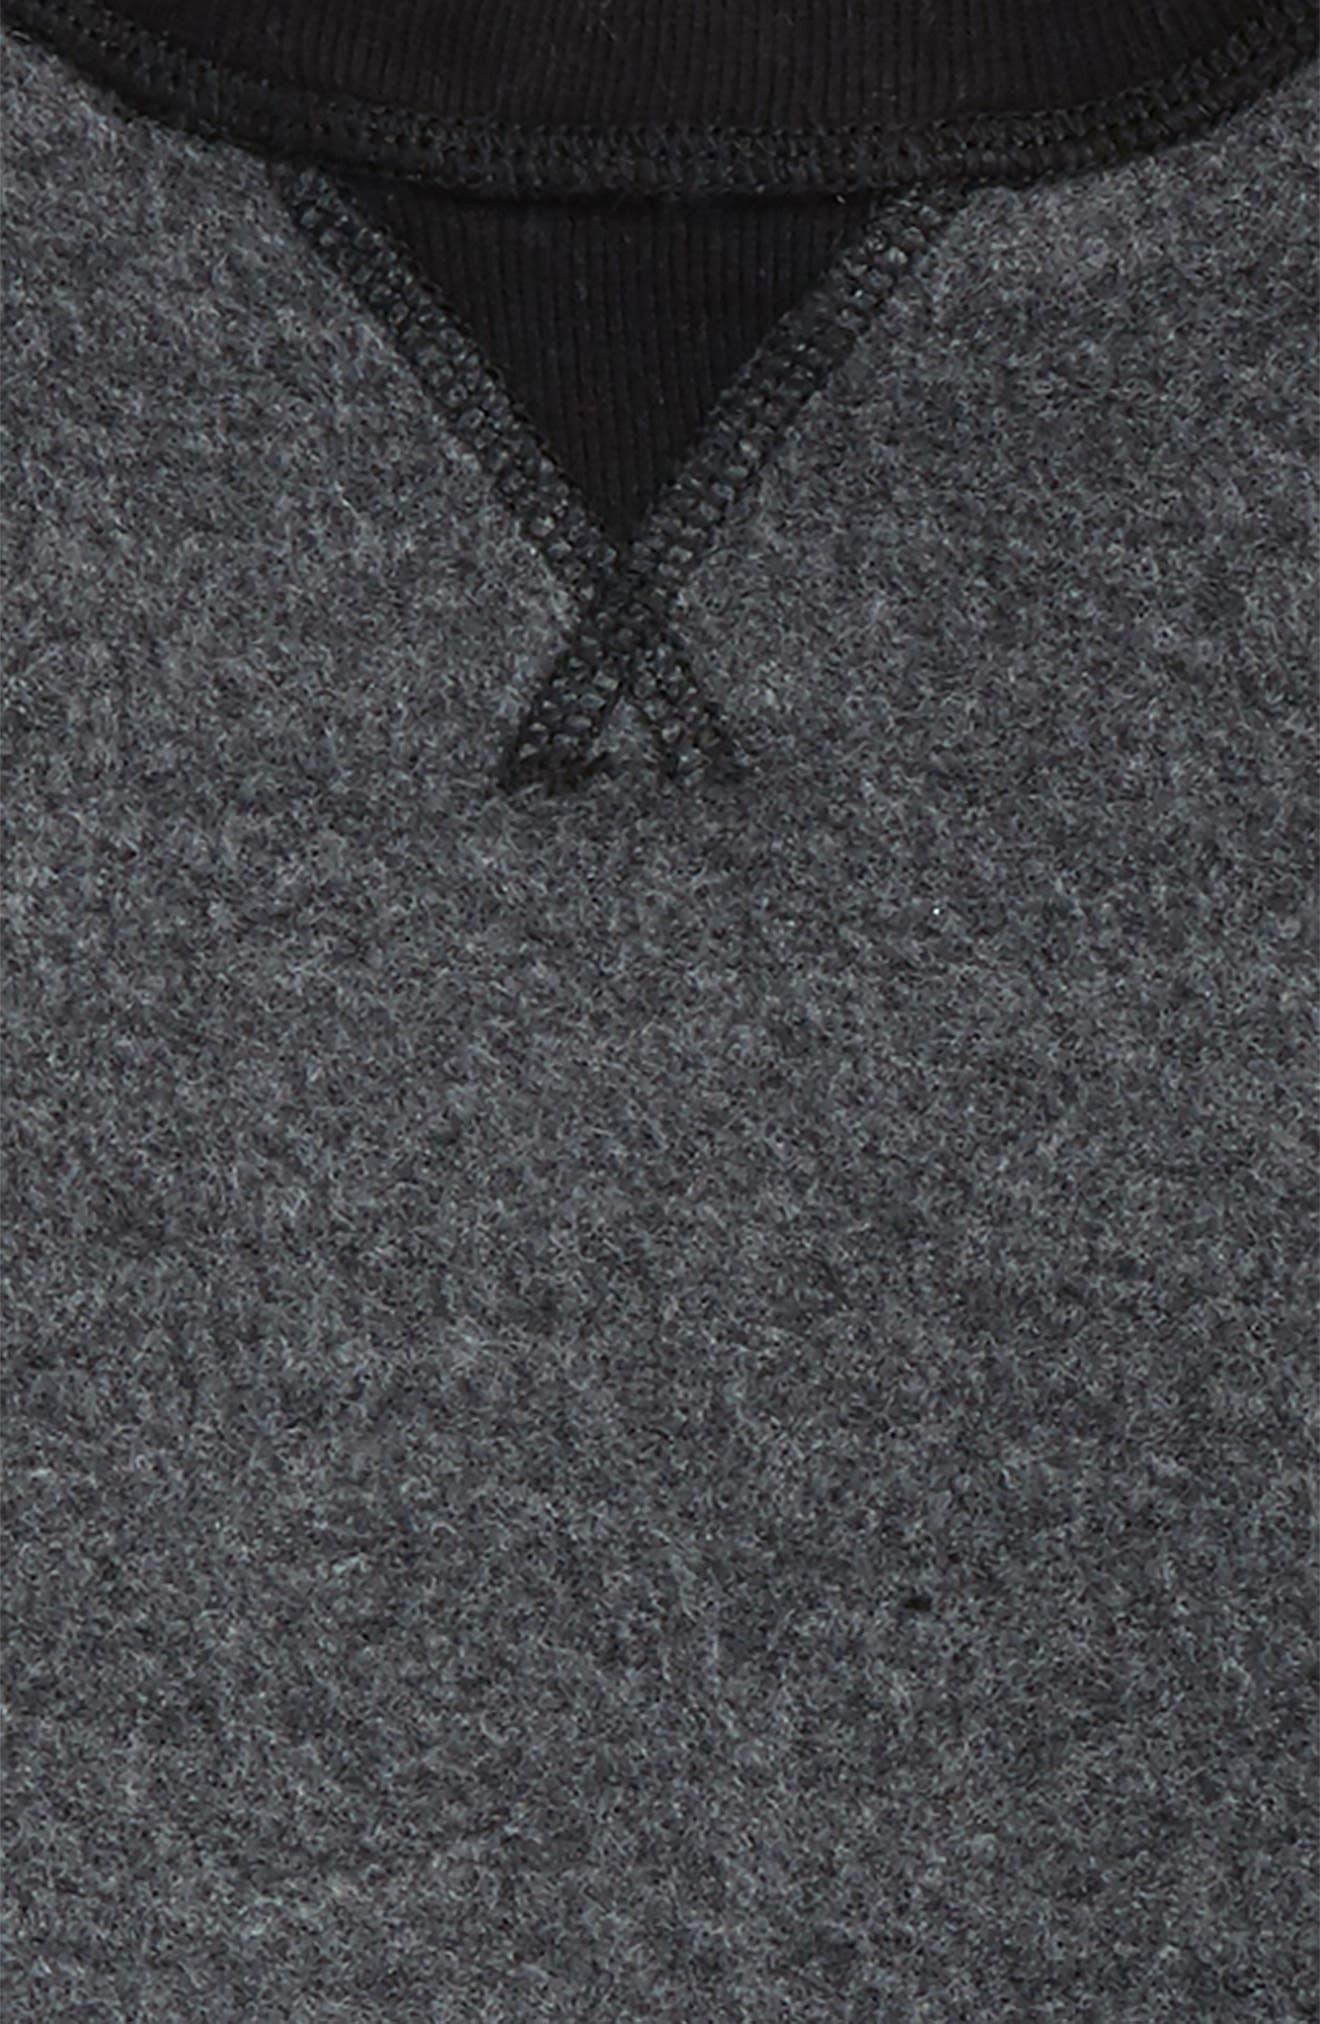 Reverse Crewneck Sweatshirt,                             Alternate thumbnail 2, color,                             Grey Charcoal Heather